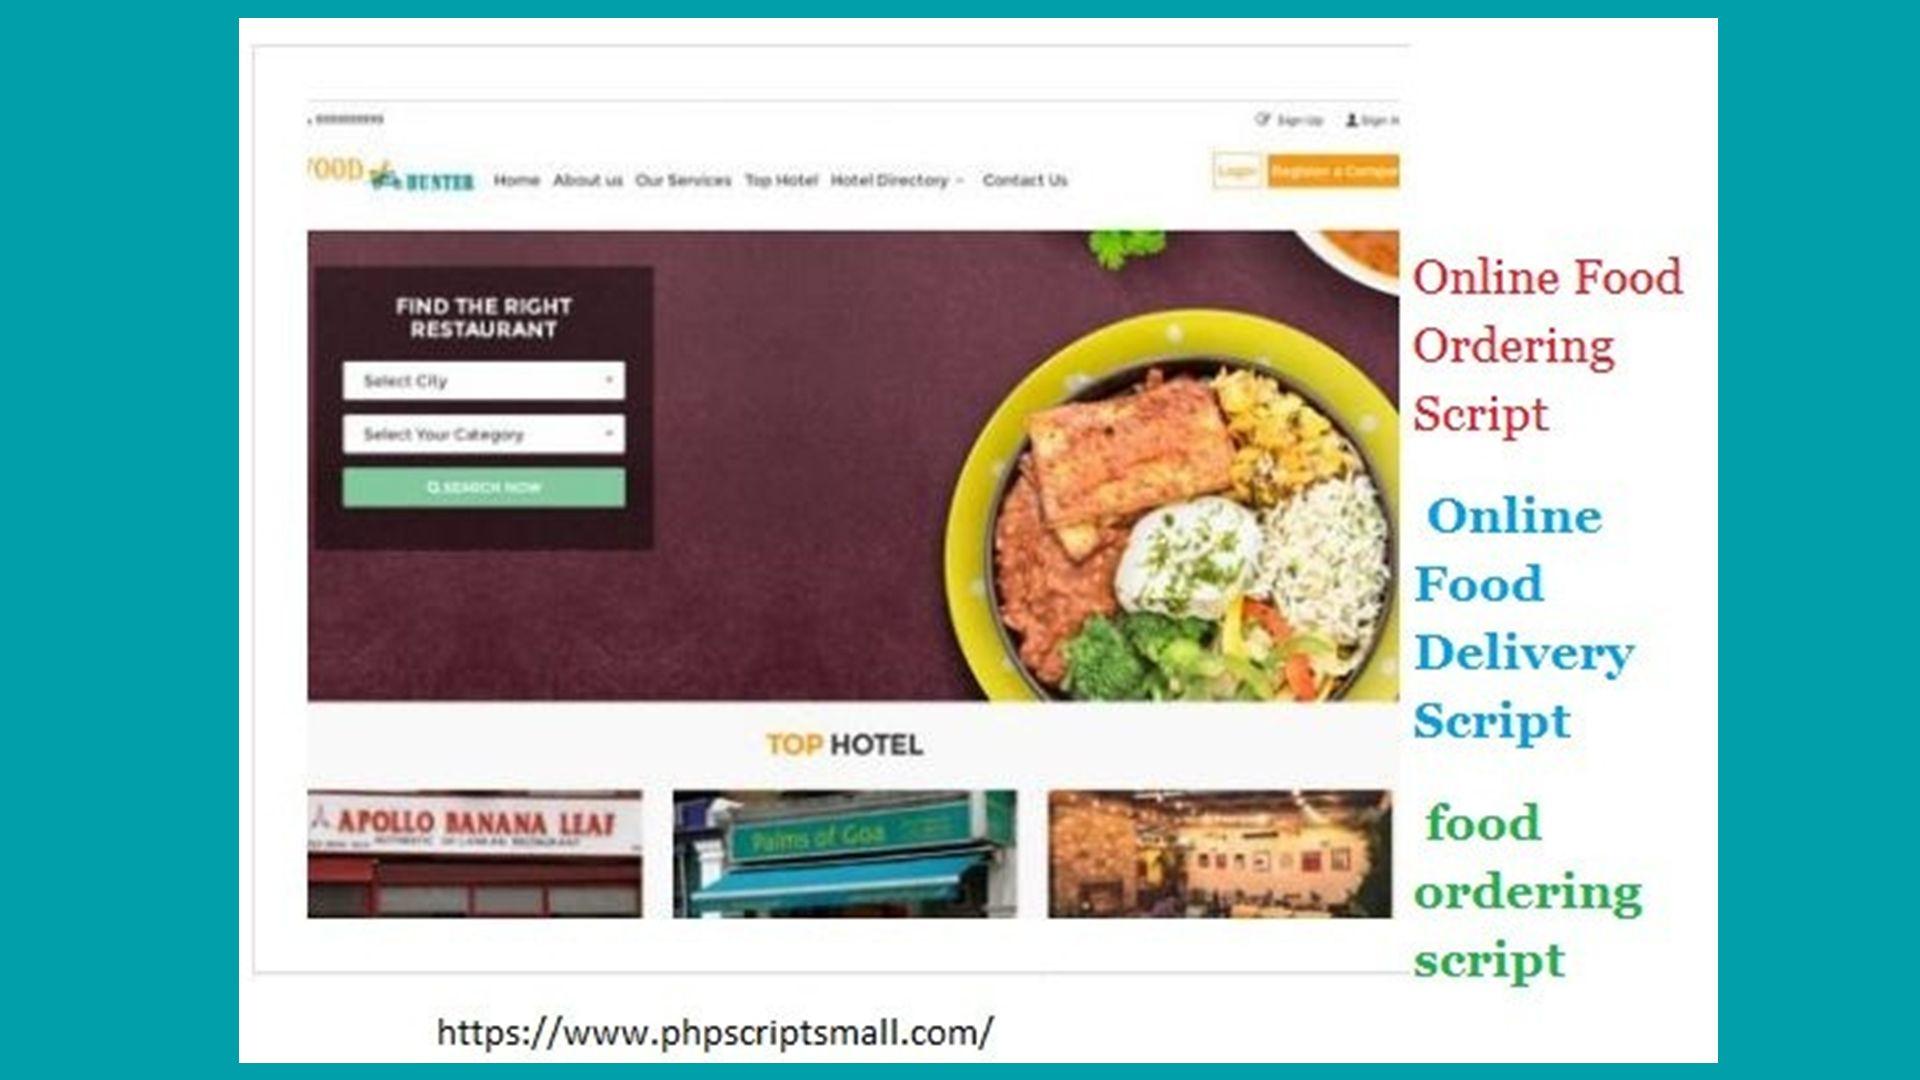 ONLINE FOOD ORDERING SCRIPT | ONLINE FOOD DELIVERY SCRIPT